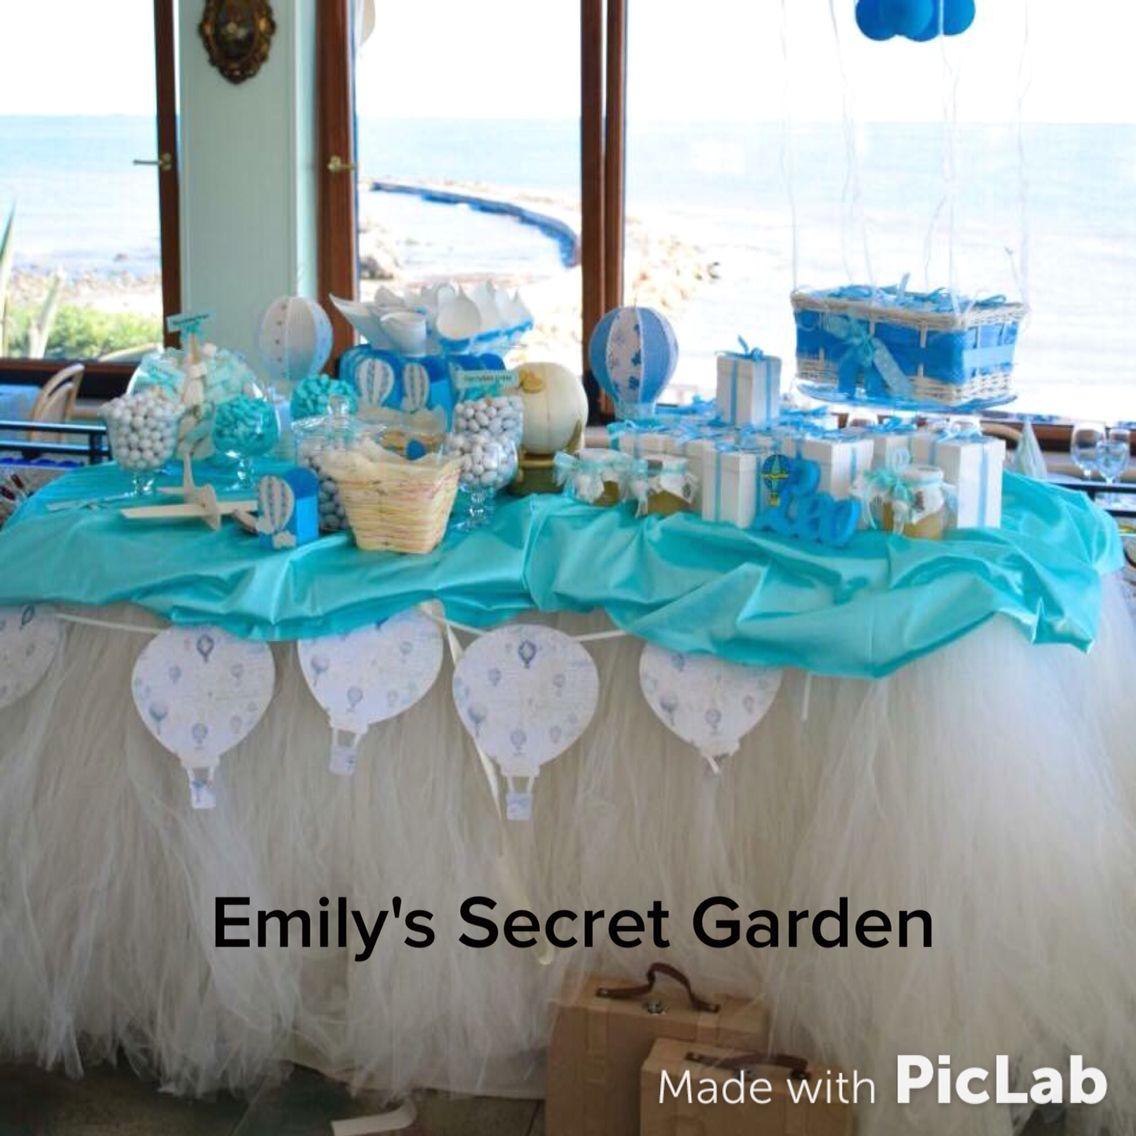 Famoso Battesimo tema mongolfiera! Maggio 2015 | Emily's secret garden  NE36